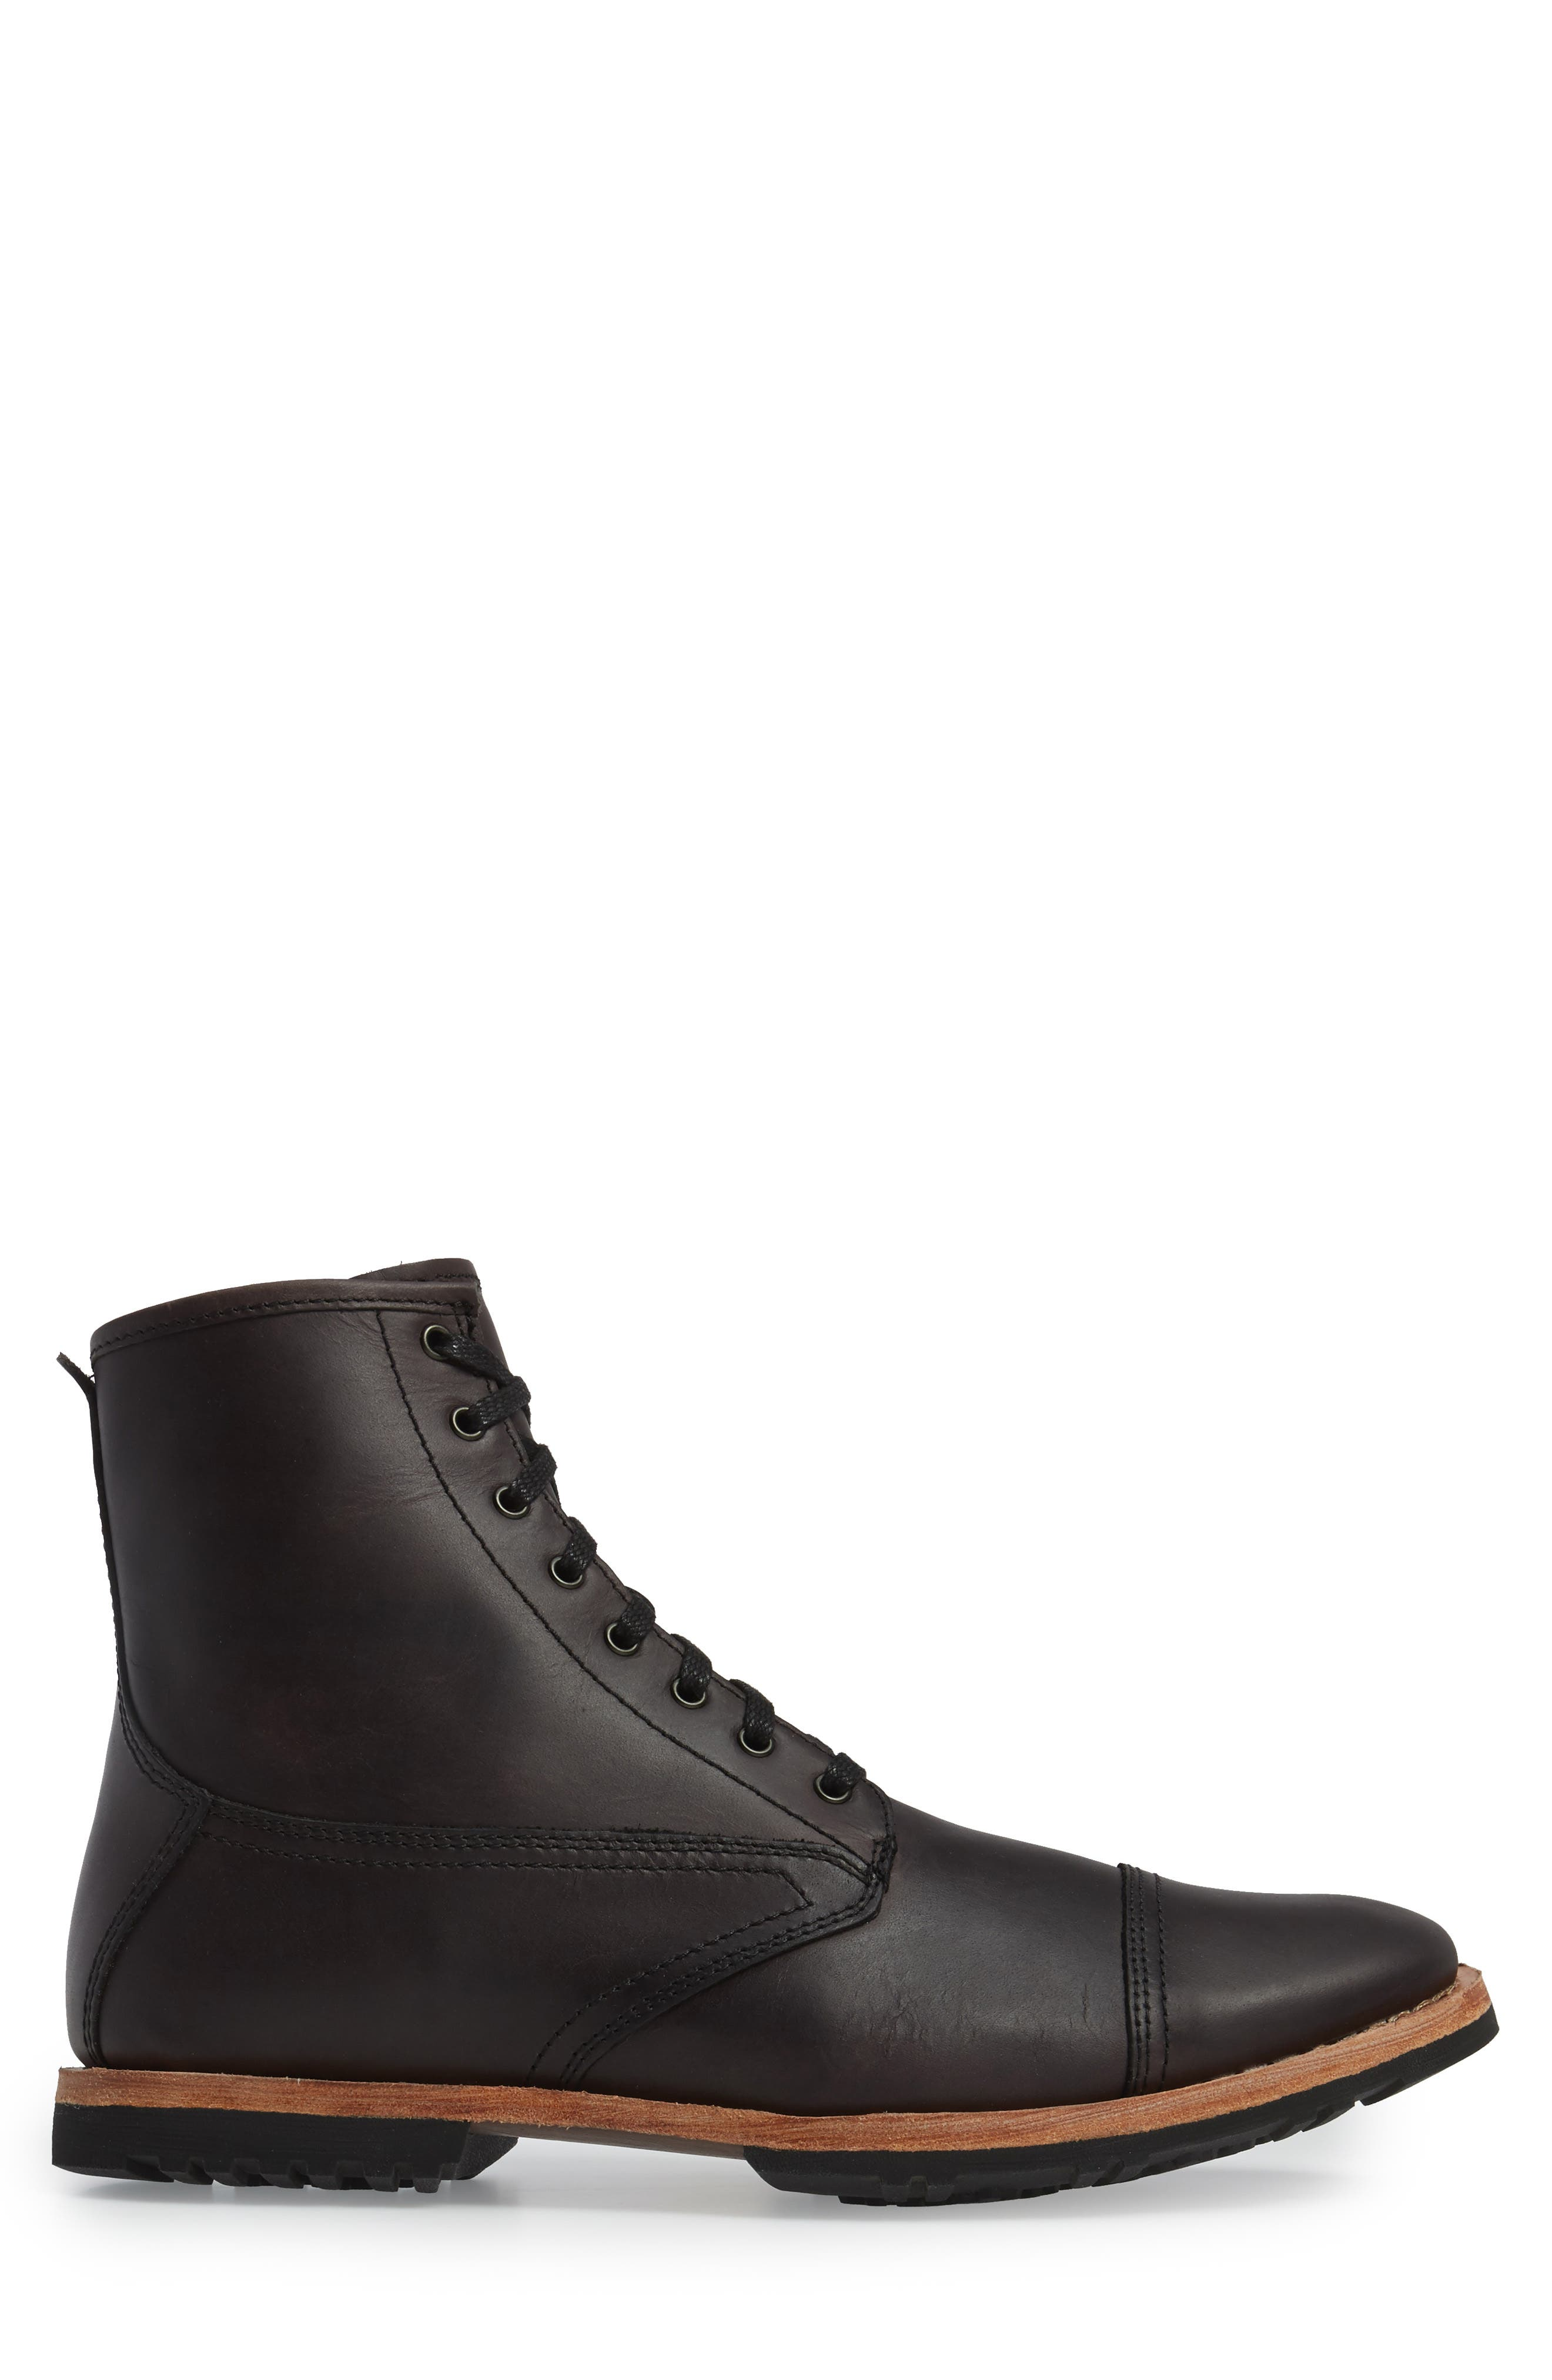 Alternate Image 3  - Timberland 'Bardstown' Cap Toe Boot (Men)